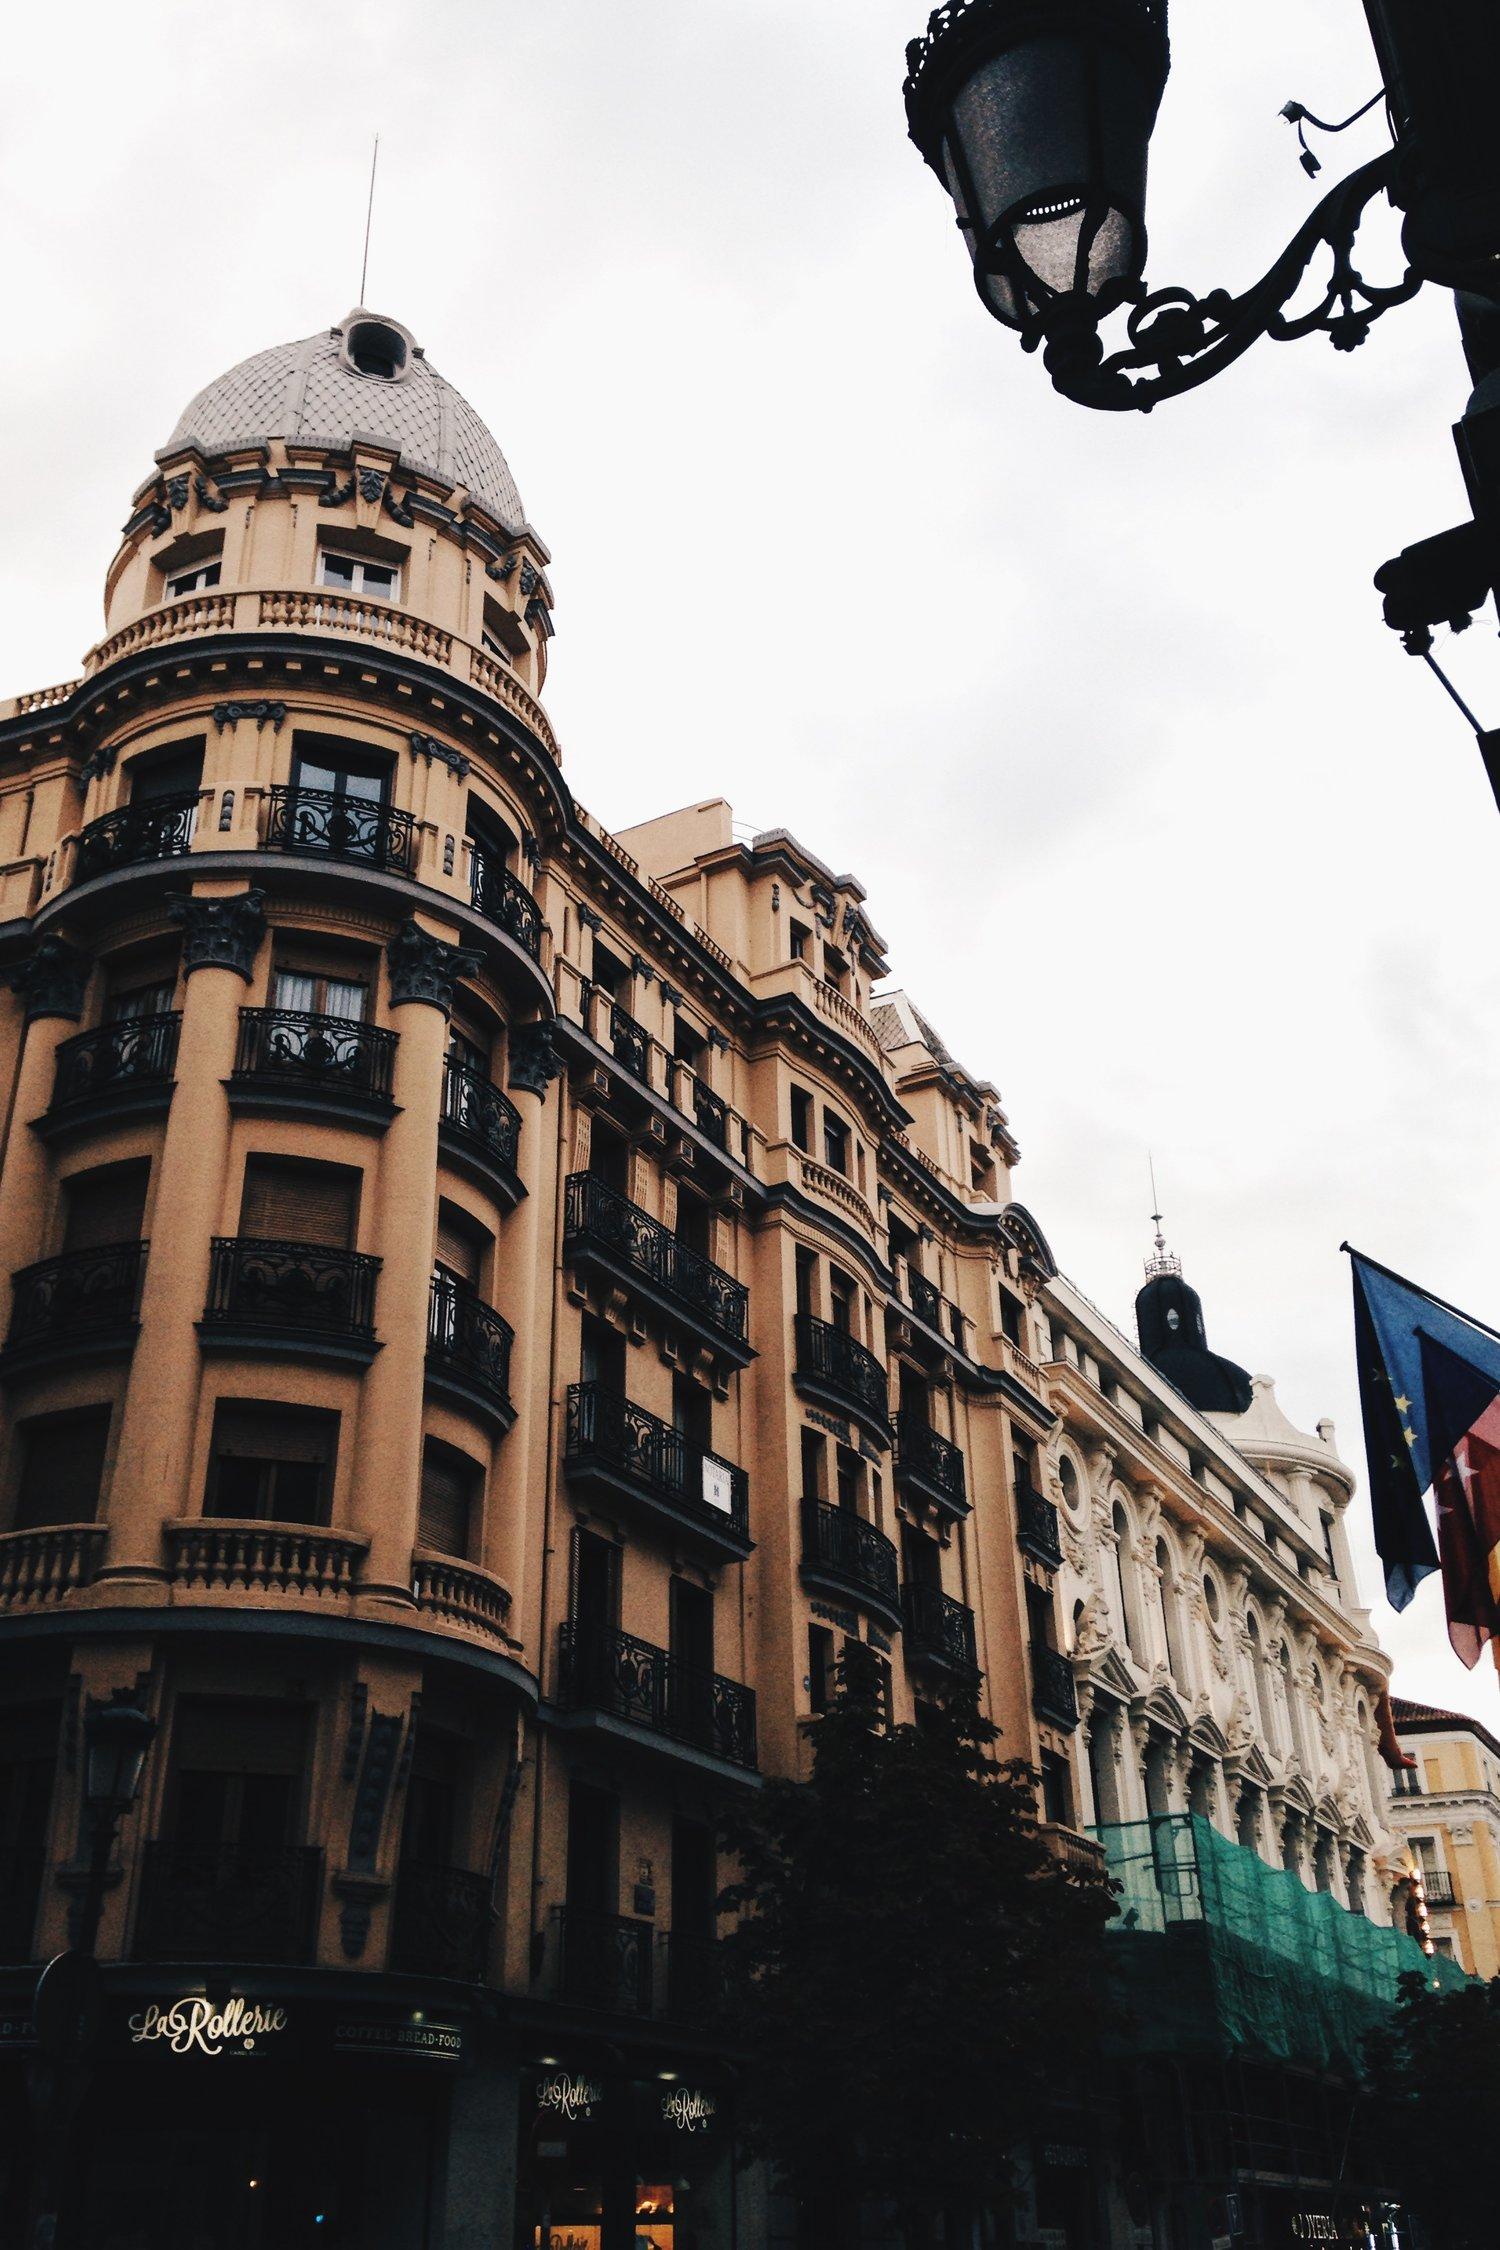 Spain - Madrid, Malaga, Sevilla